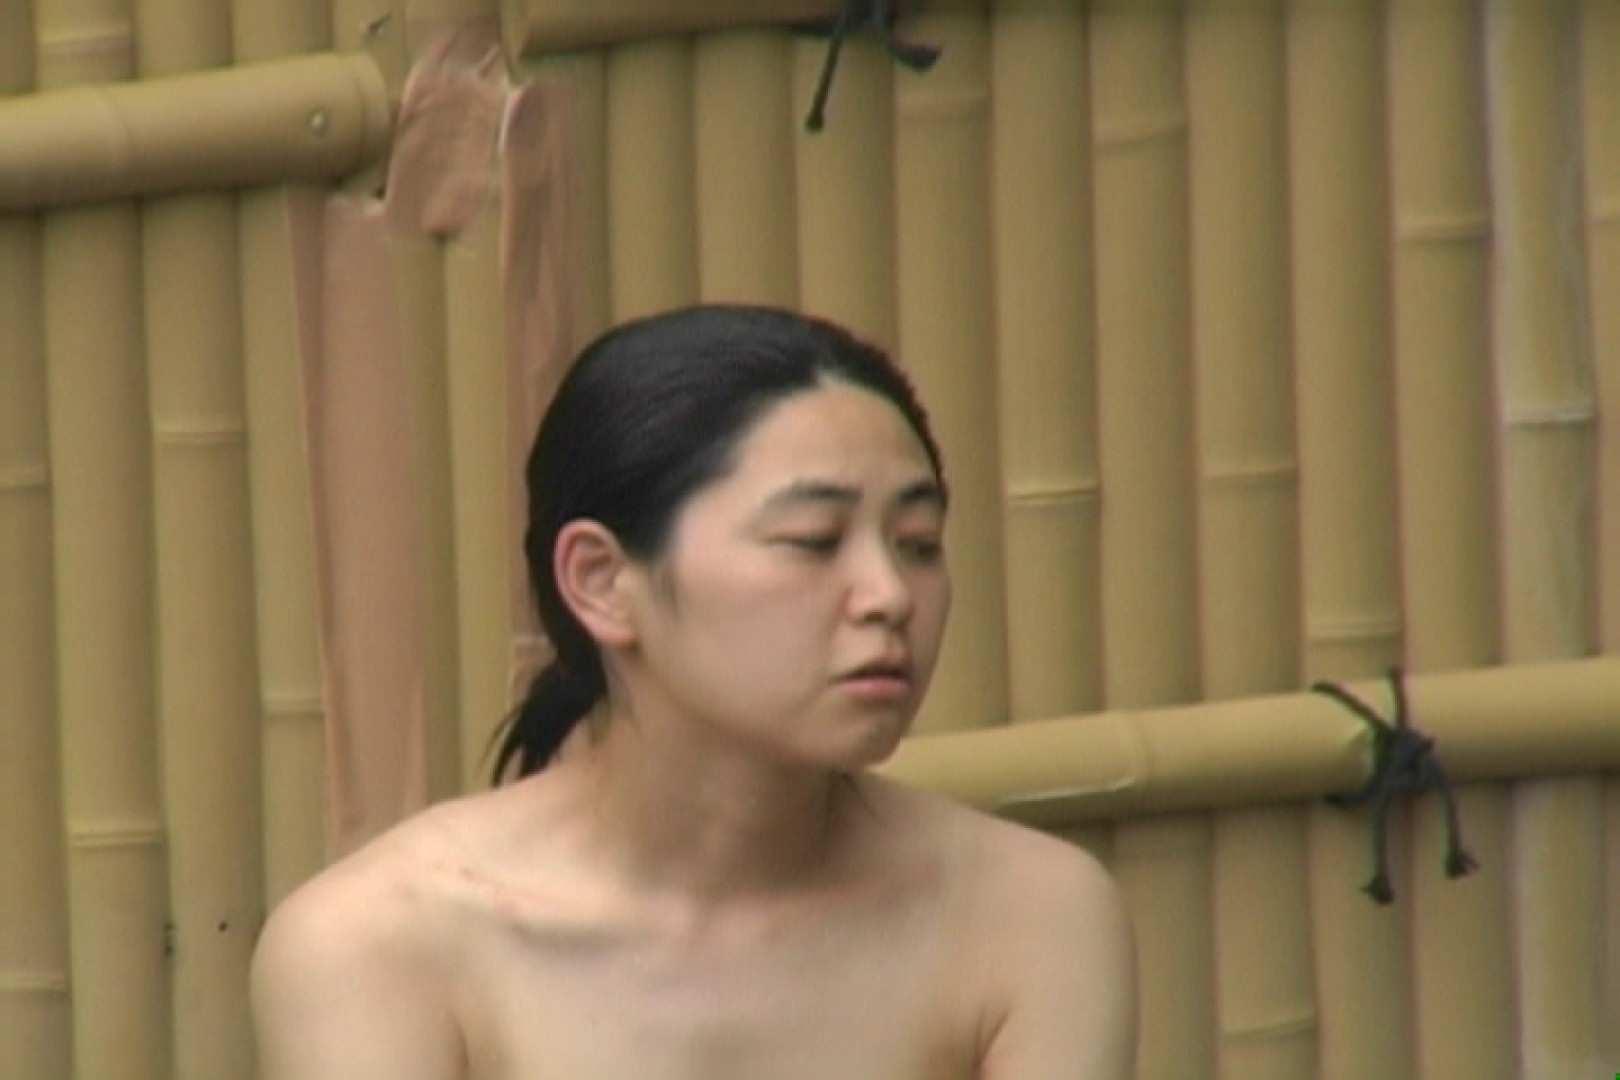 Aquaな露天風呂Vol.623 盗撮 SEX無修正画像 97画像 47